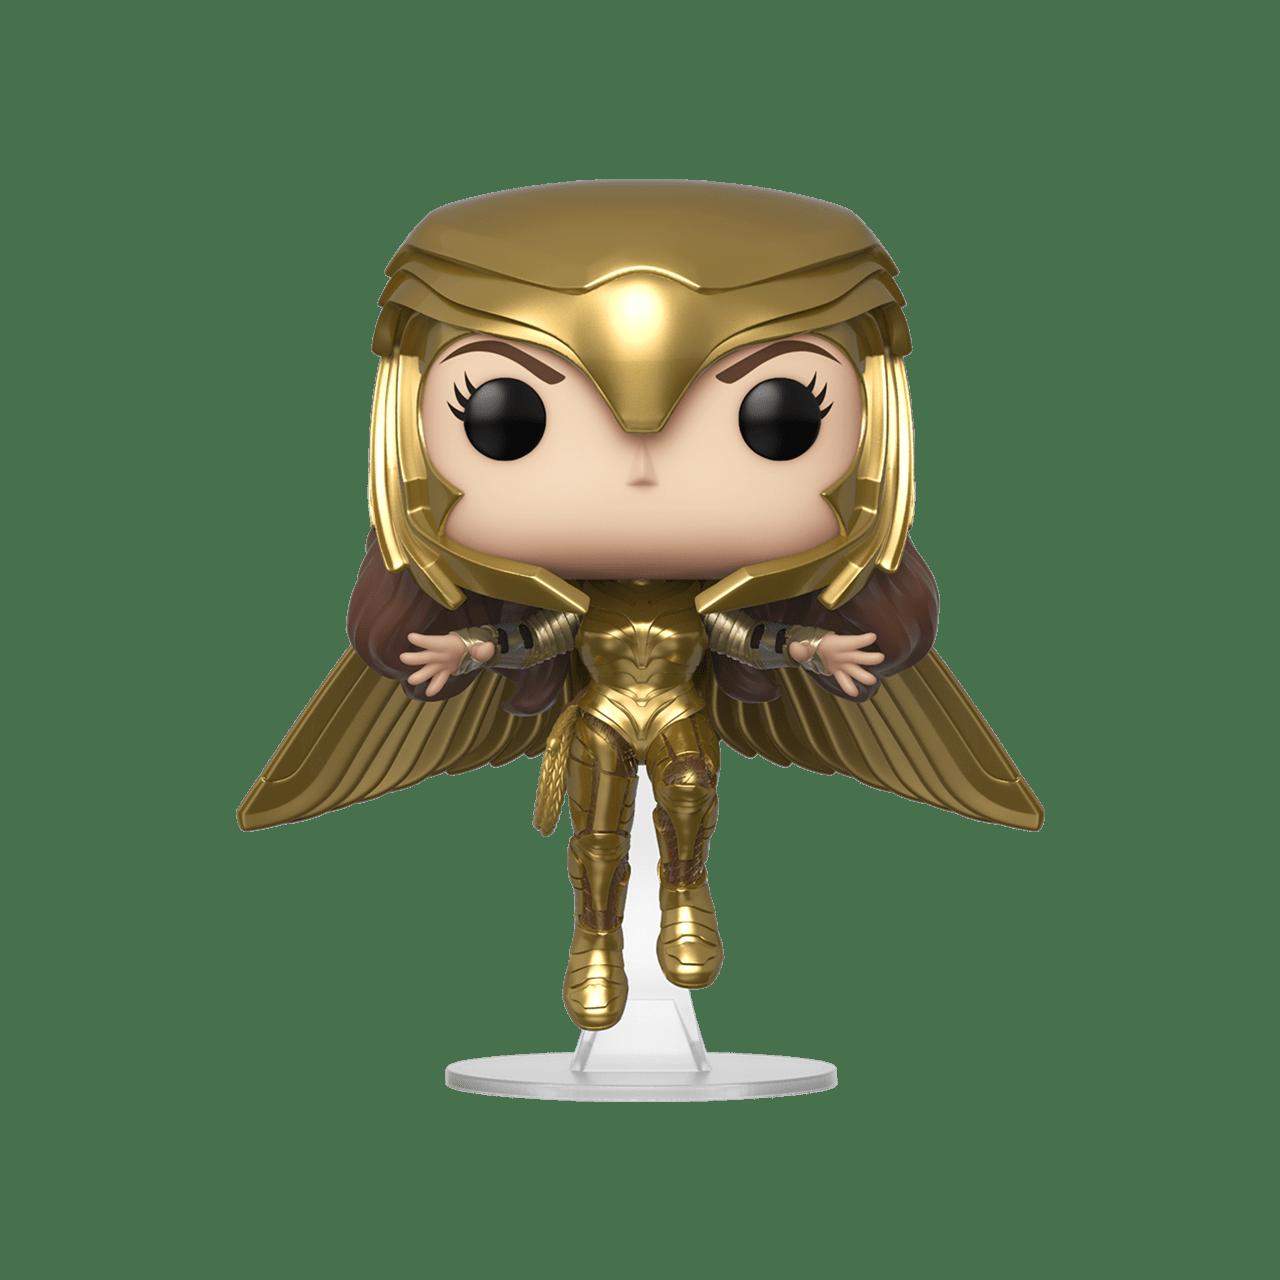 Wonder Woman 1984 Golden Armour Flying (324) DC Pop Vinyl - 1